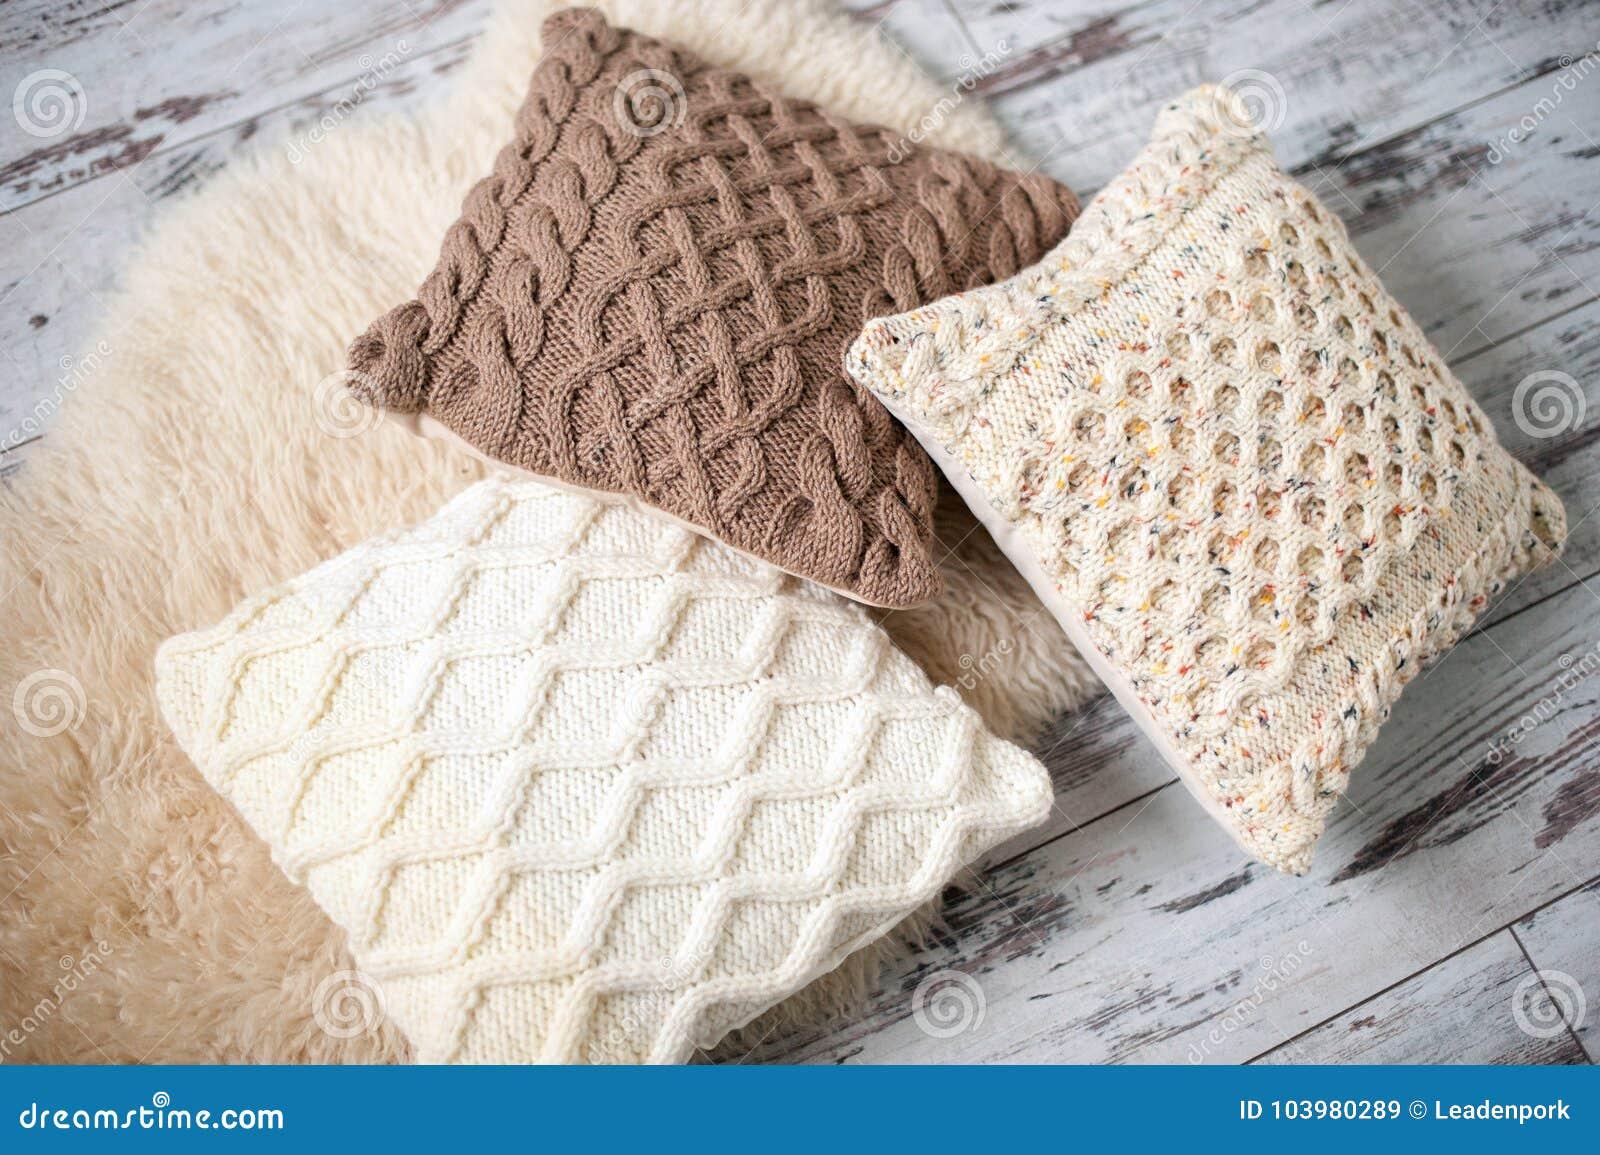 8acfa830f680 Πλεκτά μαξιλάρια των φυσικών σκιών Στοκ Εικόνα - εικόνα από cosiness ...